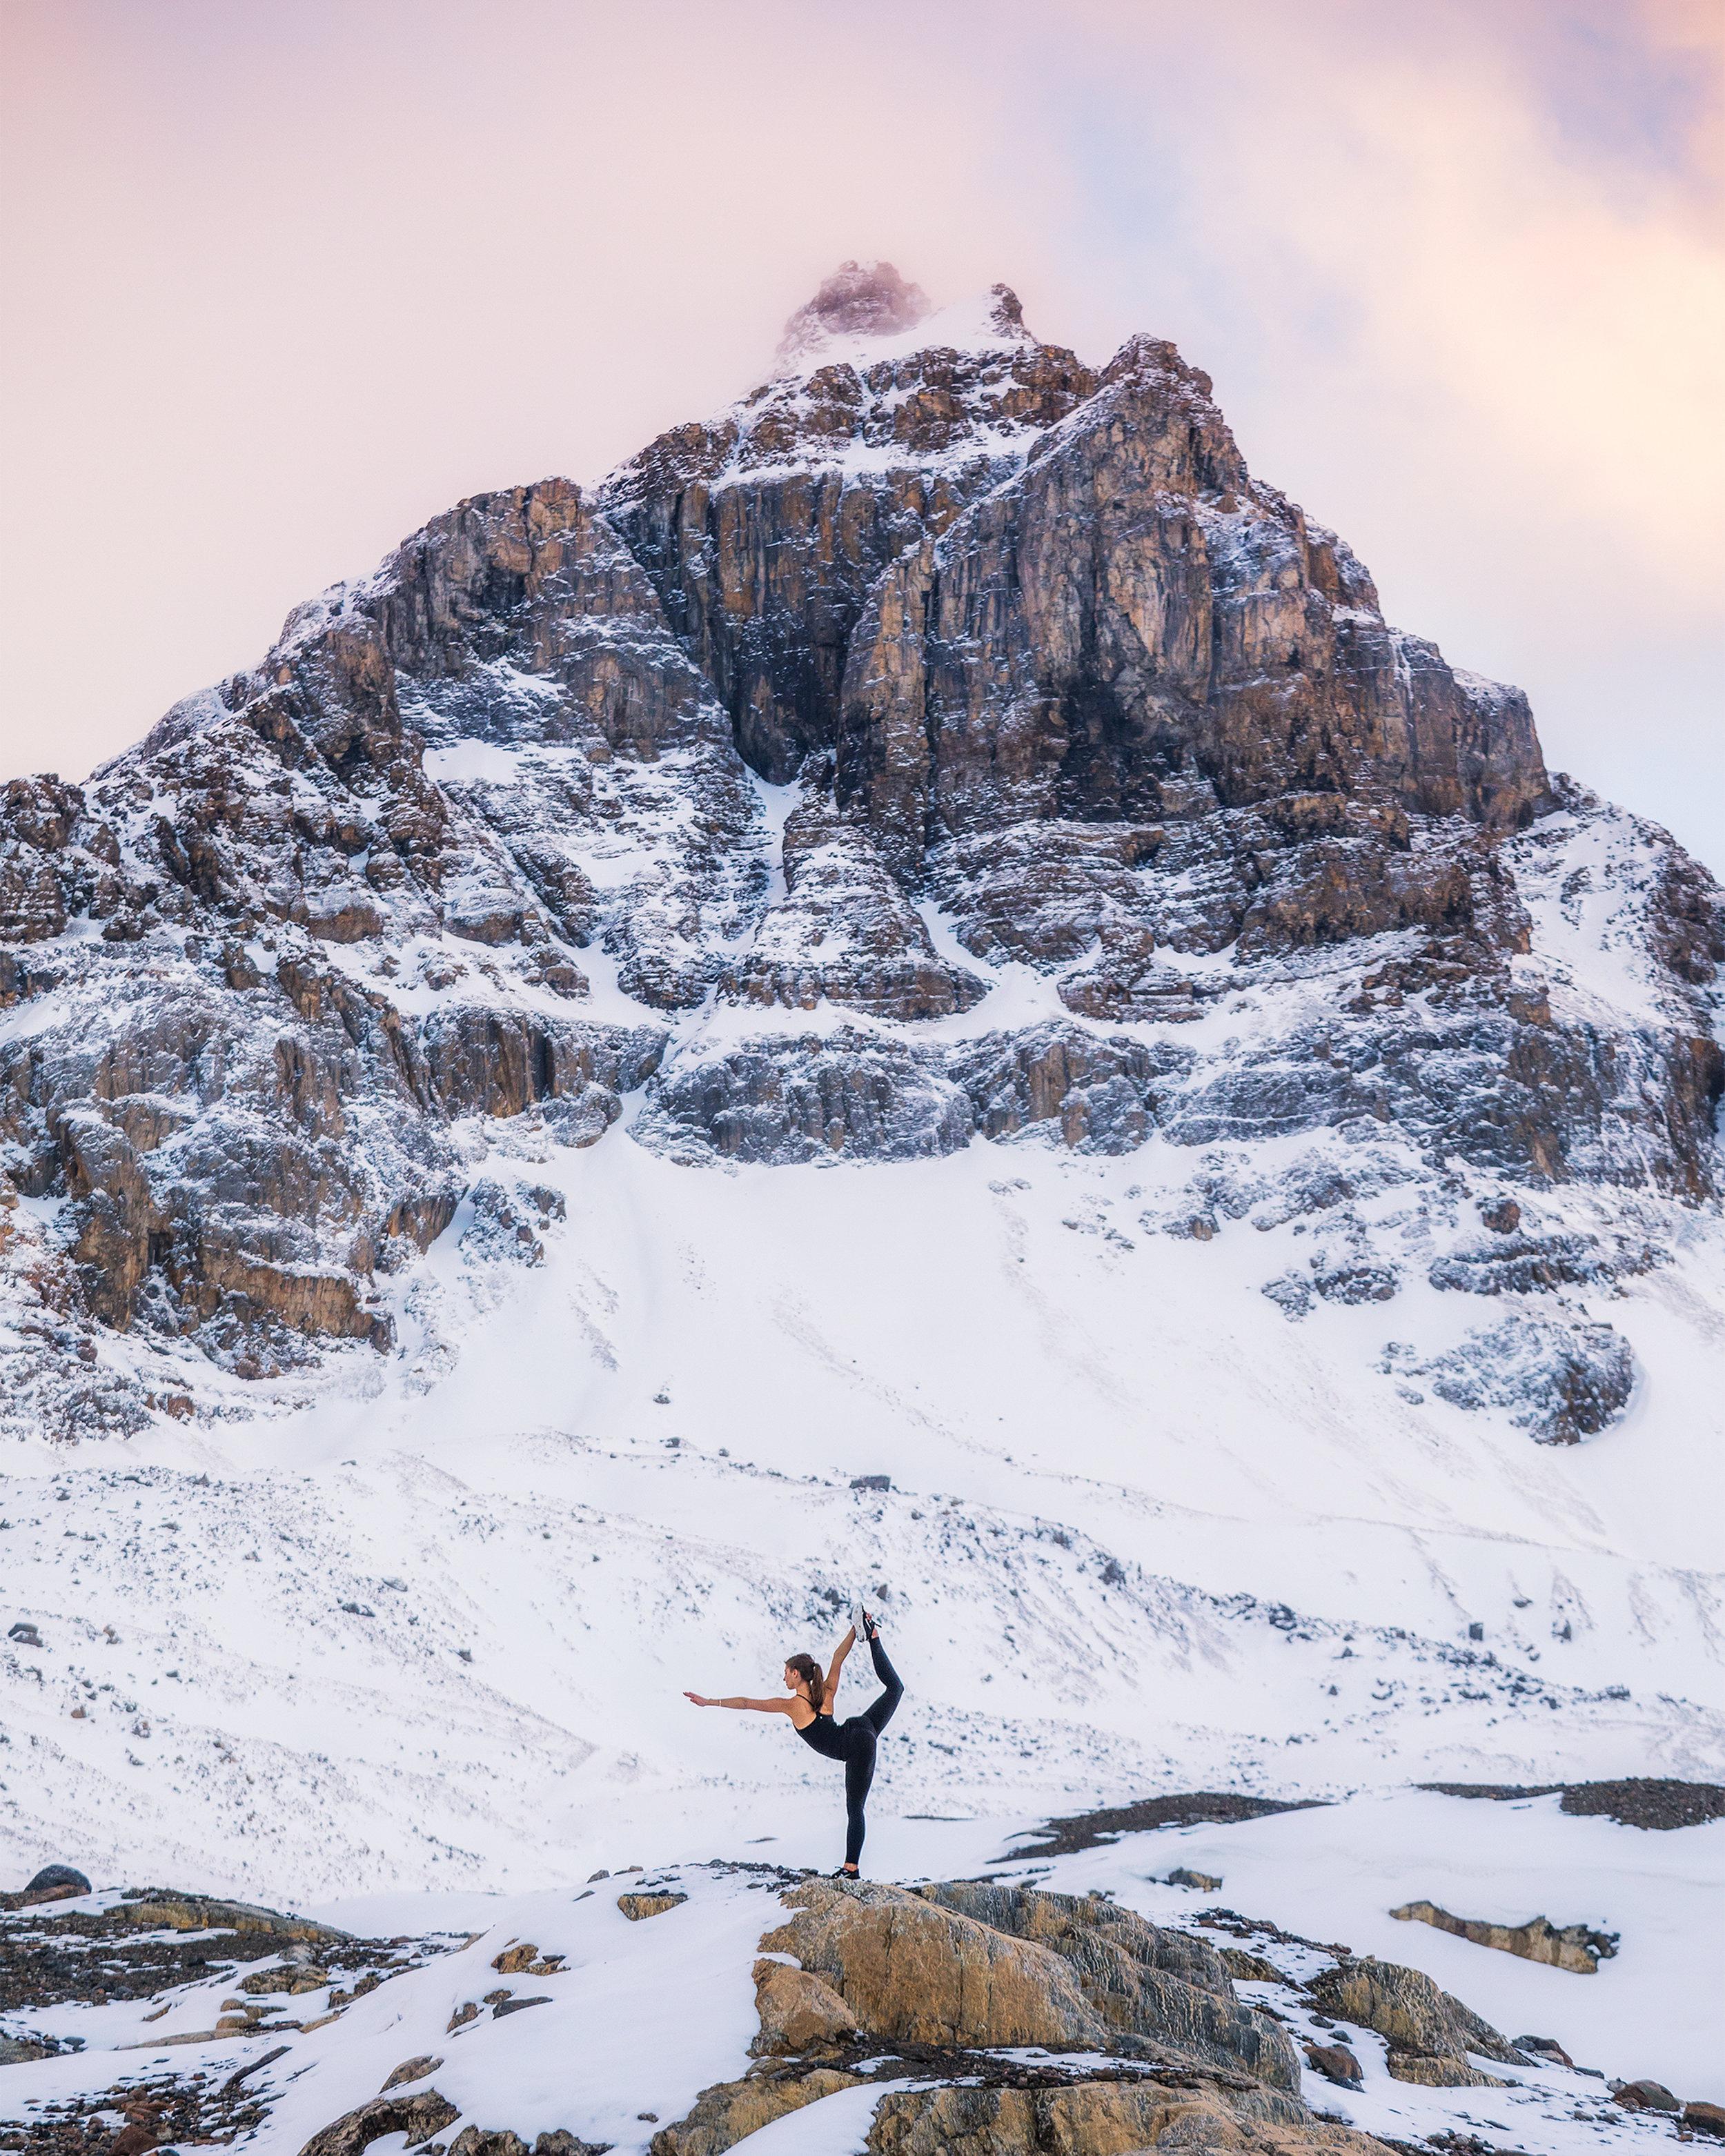 Andrea-doing-yoga-at-Athebasca-Glacier-by-Michael-Matti.jpg